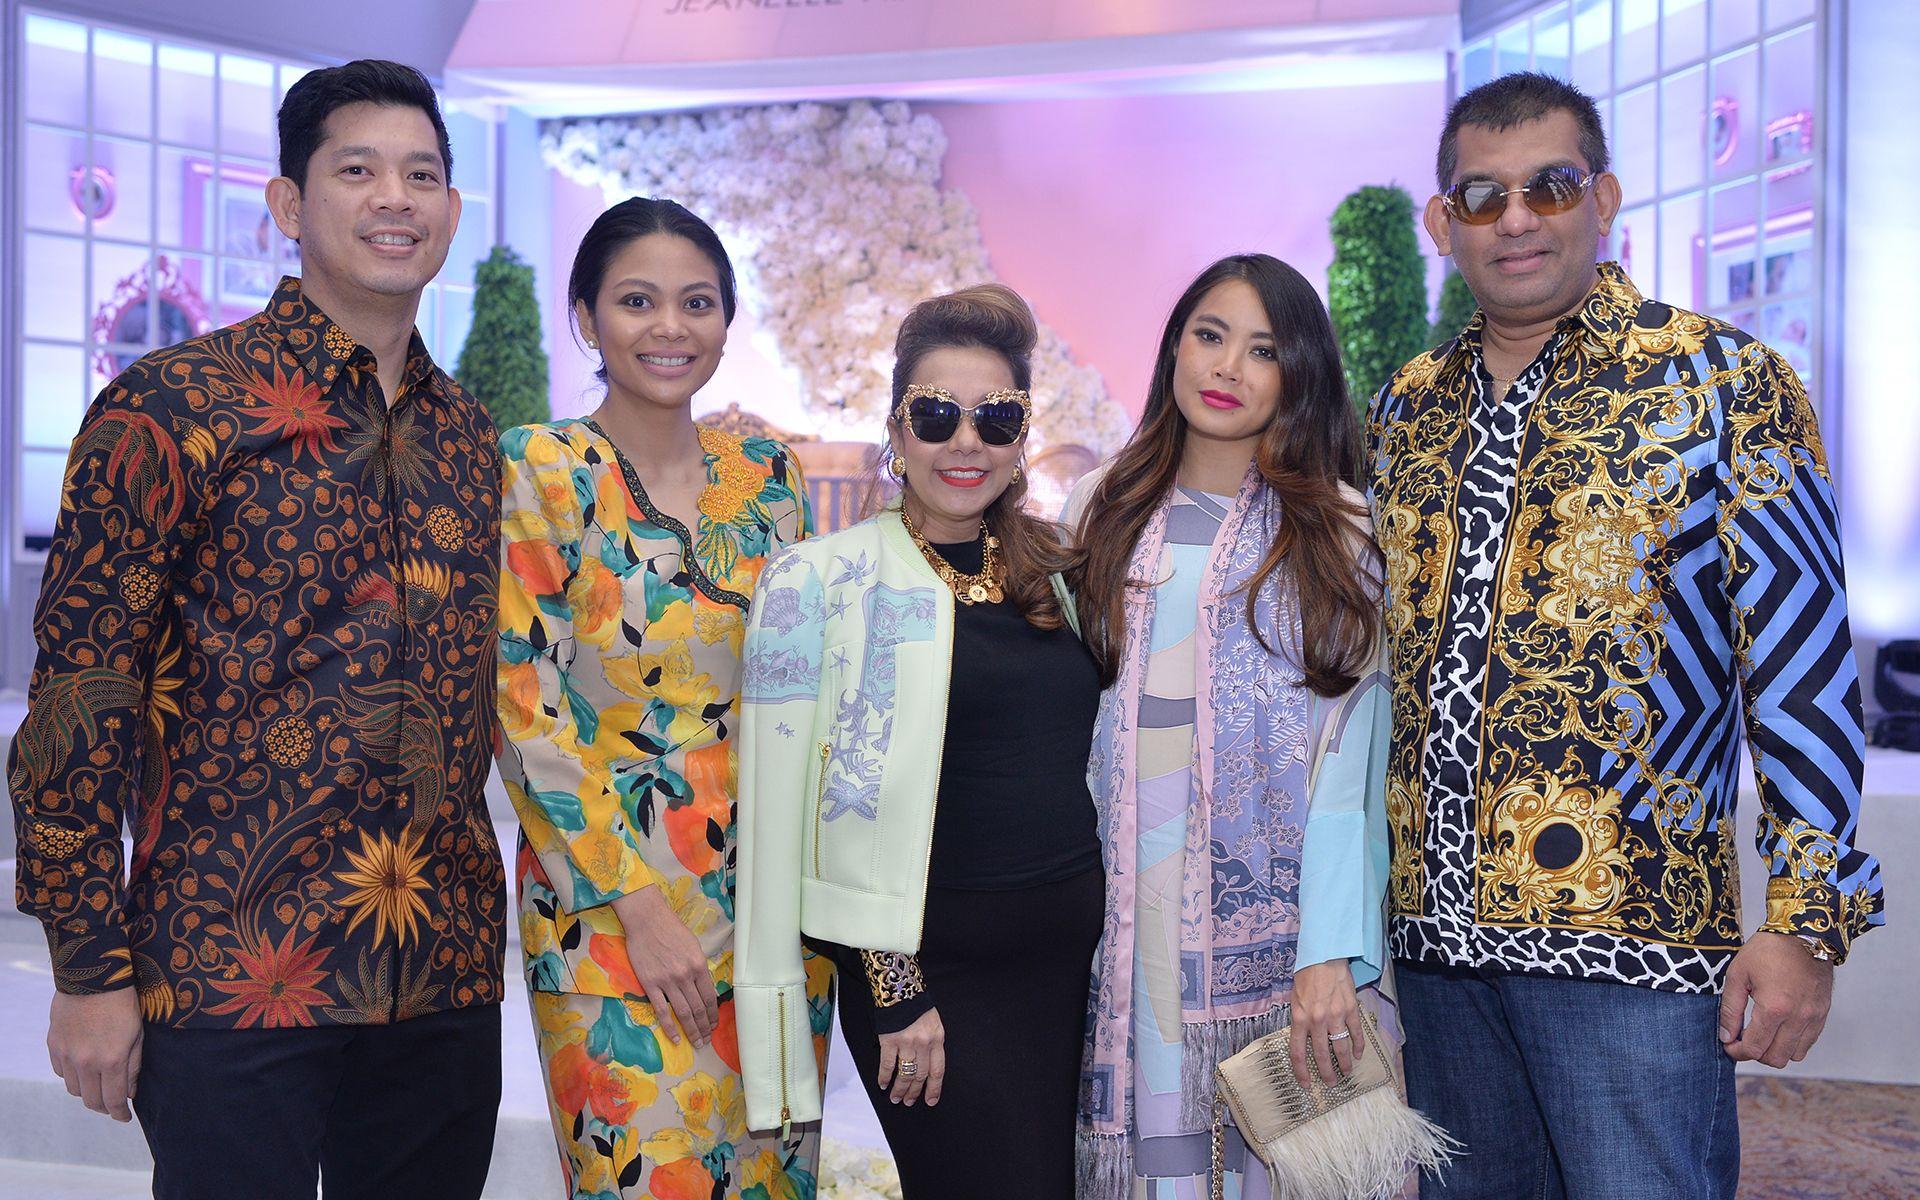 Shazlan Sufian, Zaireen Ayu Ibrahim,  Datin Sri Chris Abishegam, Ung Yiu Lin and Dato' Sri Andrew Abishegam